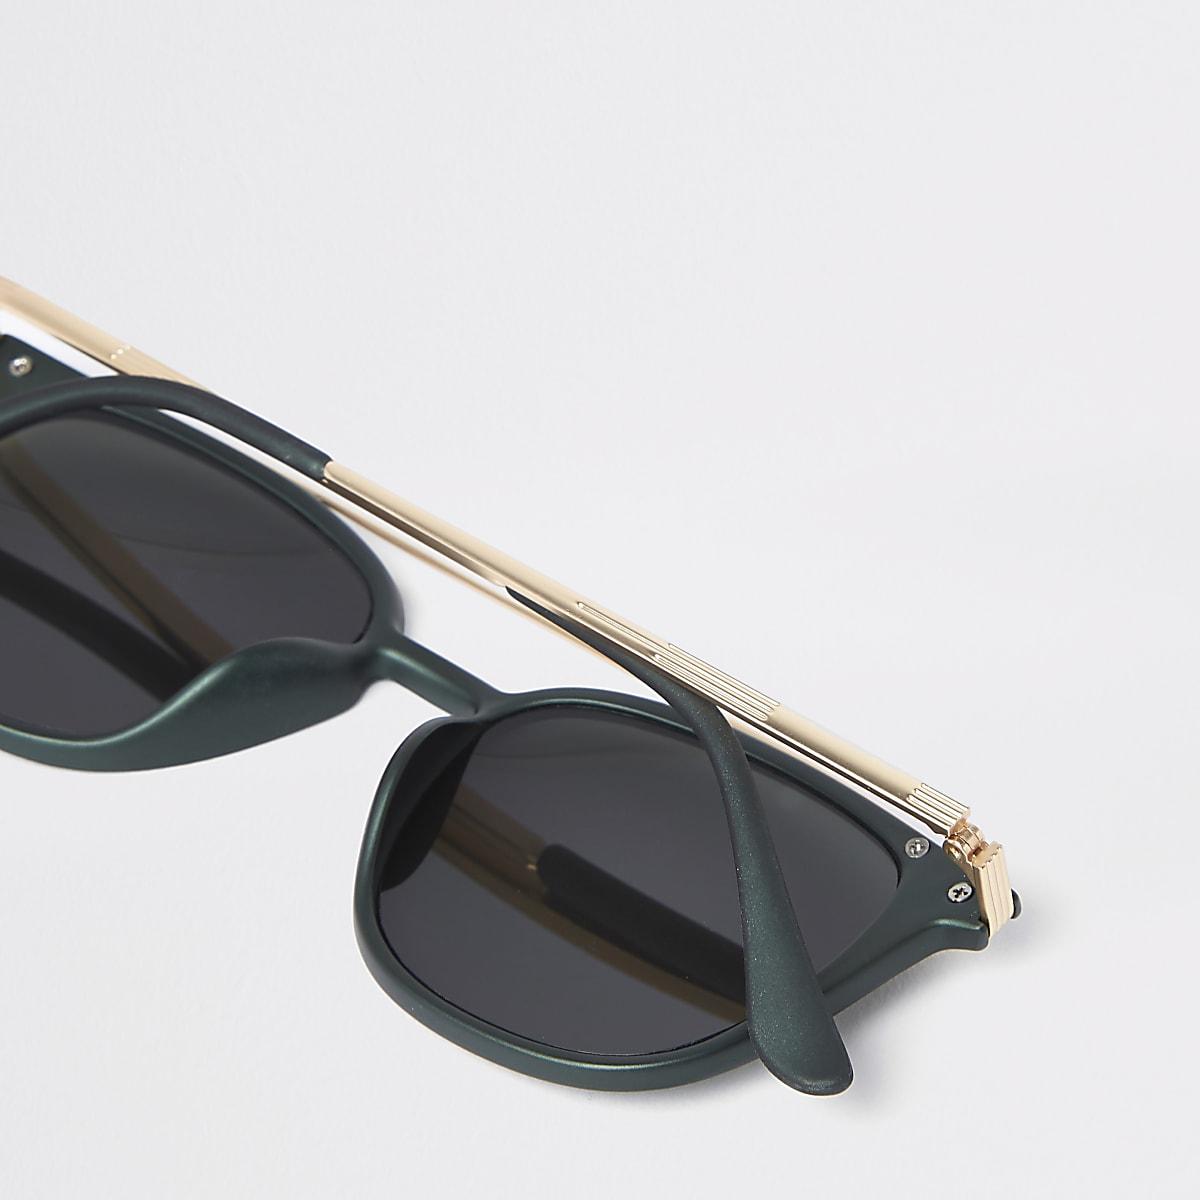 6b01fccd9 Khaki green brow bar navigator sunglasses - Aviator Sunglasses ...